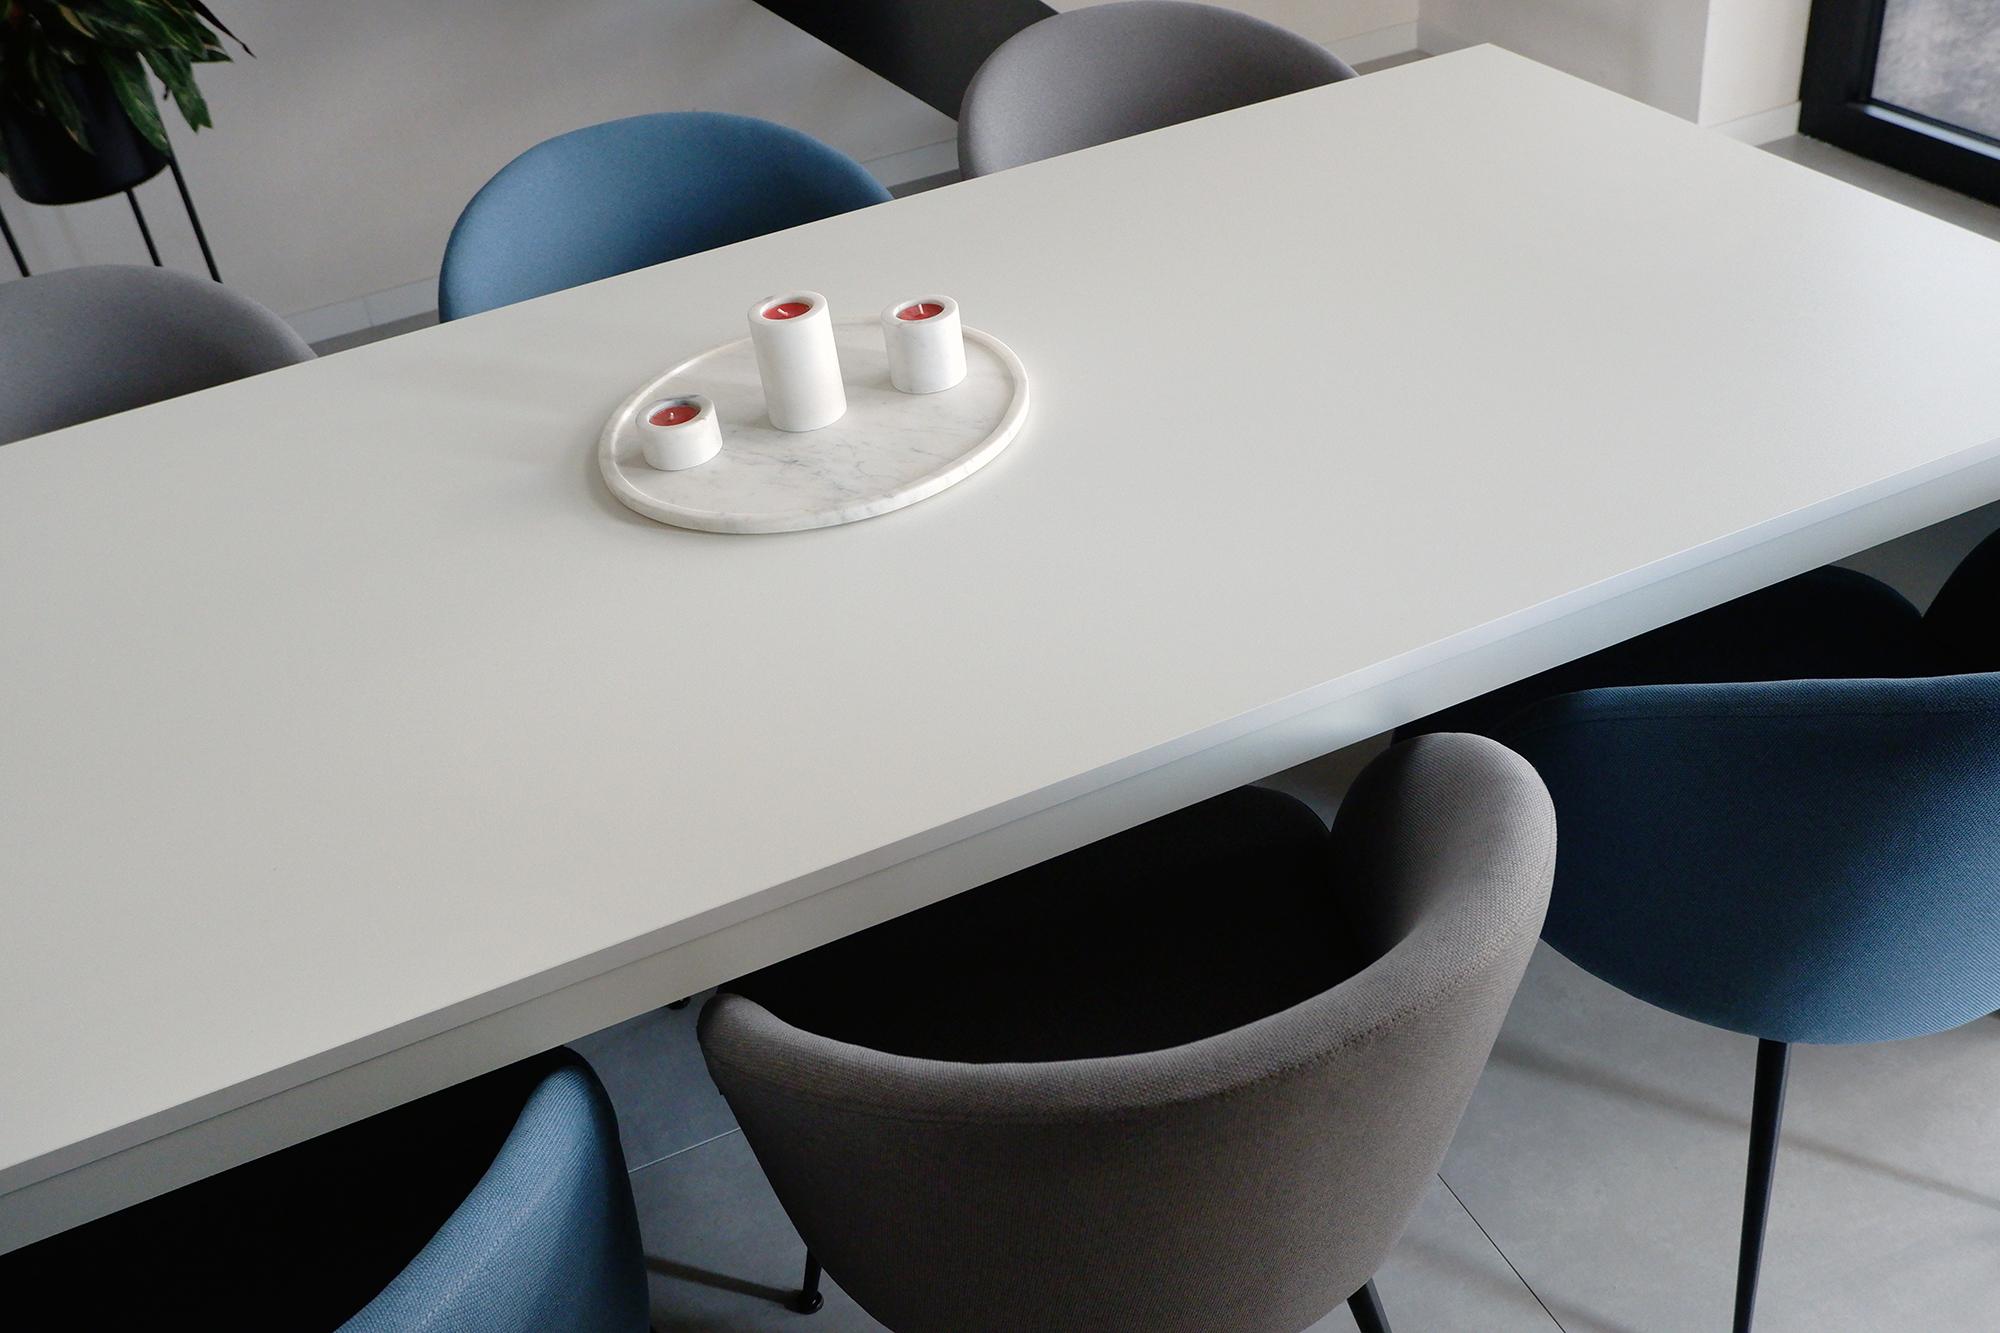 sofacompany duurzame eetkamerstoelen